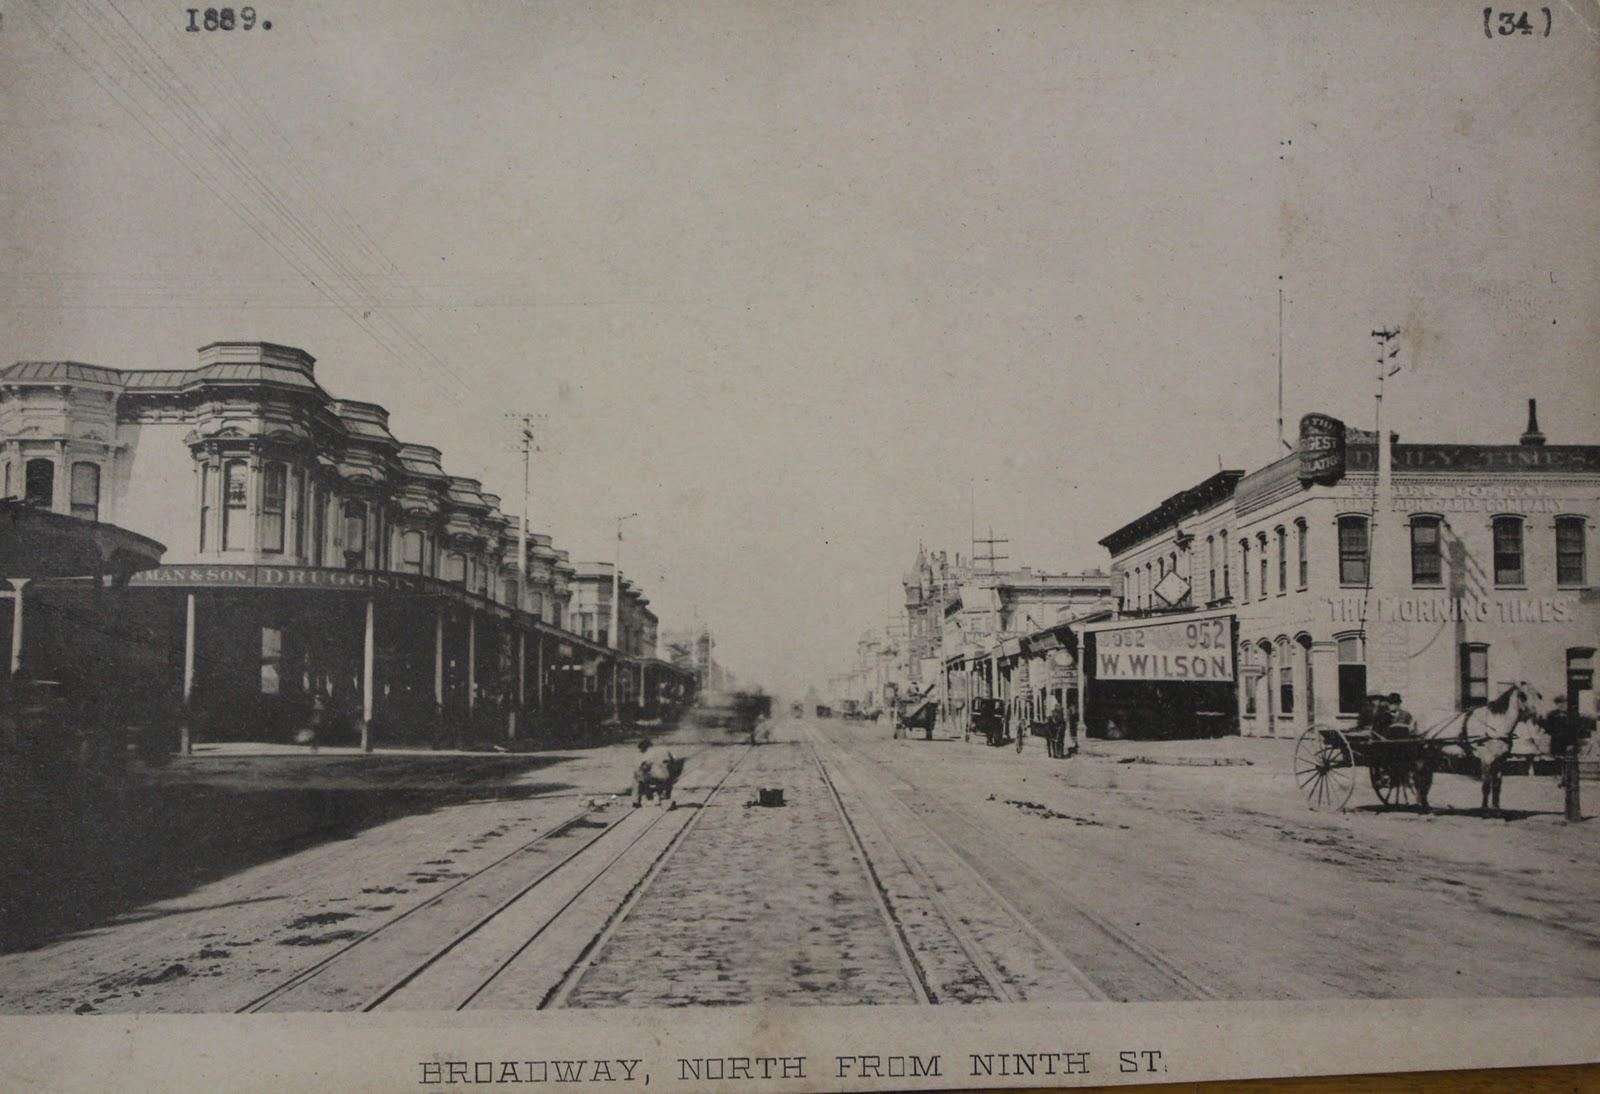 http://2.bp.blogspot.com/-lqNl291S7d0/TywcrIXqynI/AAAAAAAAAio/KxtDHMnzCOE/s1600/Downtown-Oakland-in-1889-courtesy-Oakland-History-Room.jpg